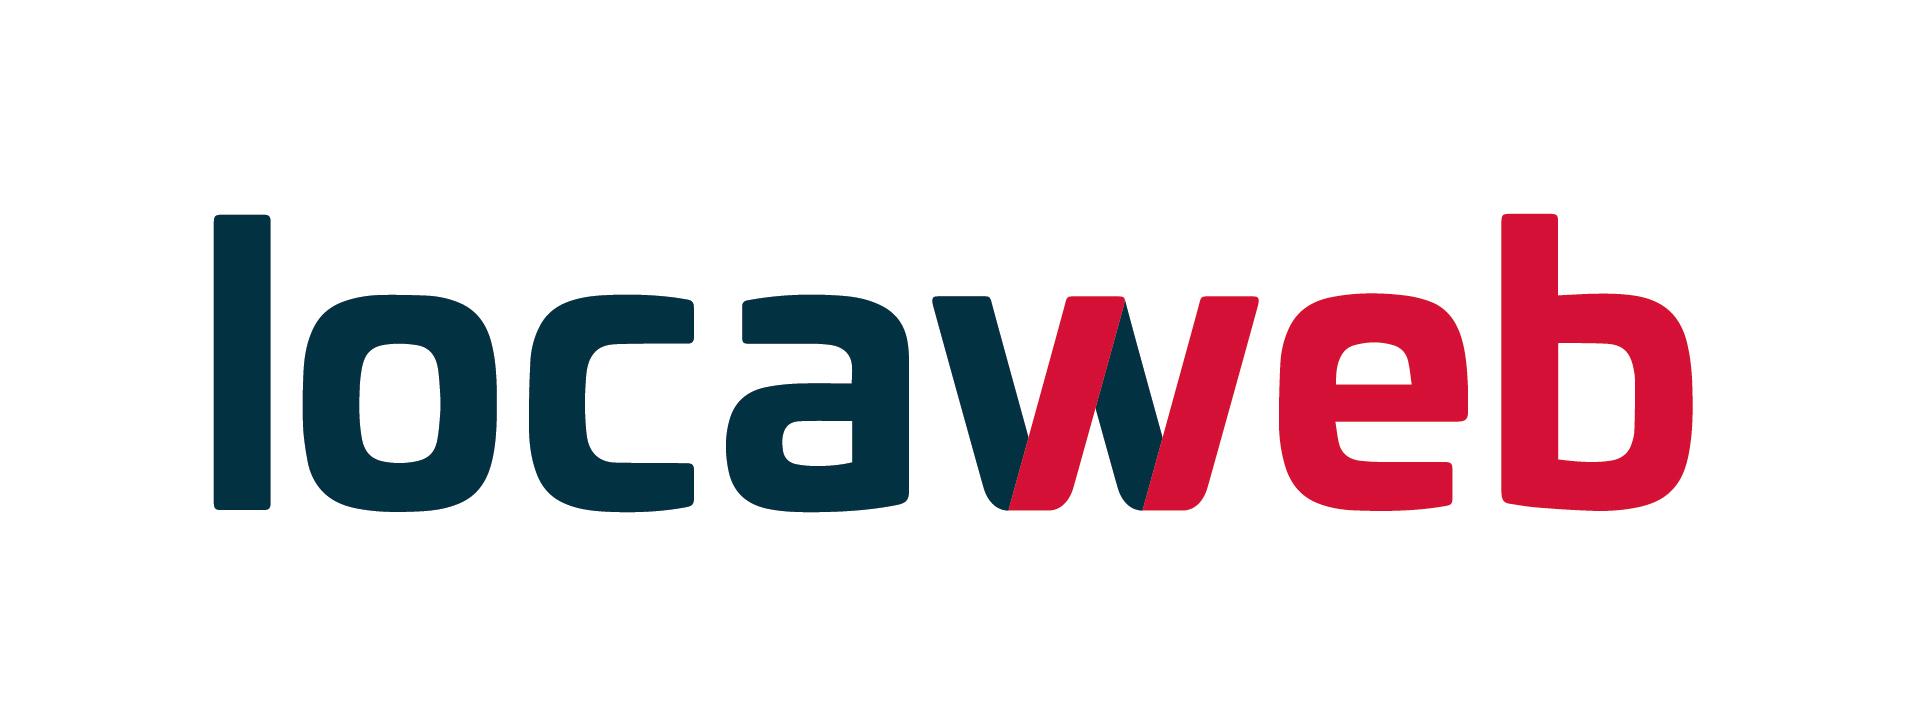 Novo logotipo Locaweb Logotype Locaweb